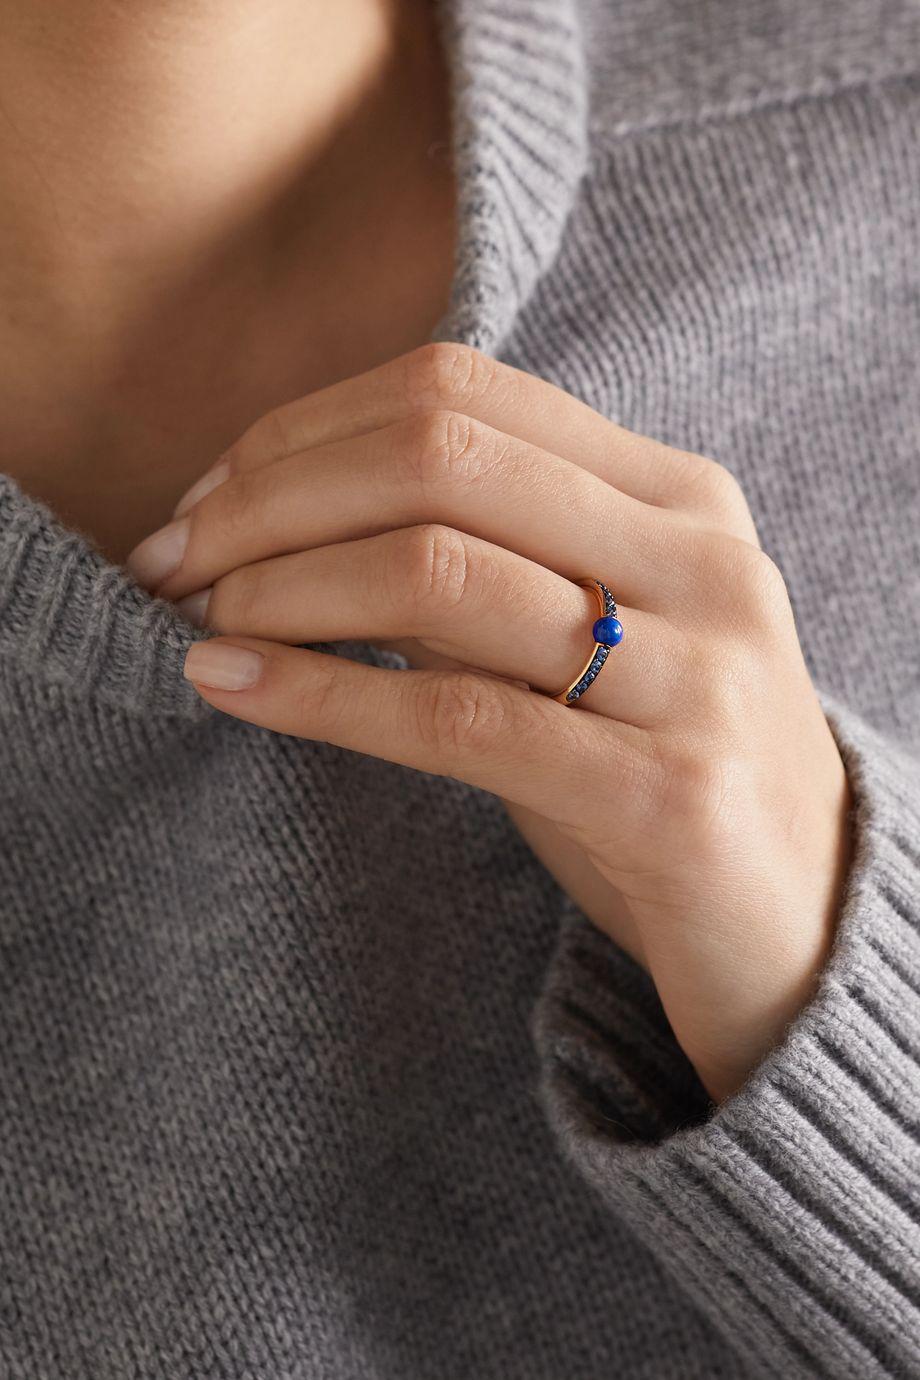 Pomellato M'ama non M'ama 18-karat rose gold, lapis lazuli and sapphire ring